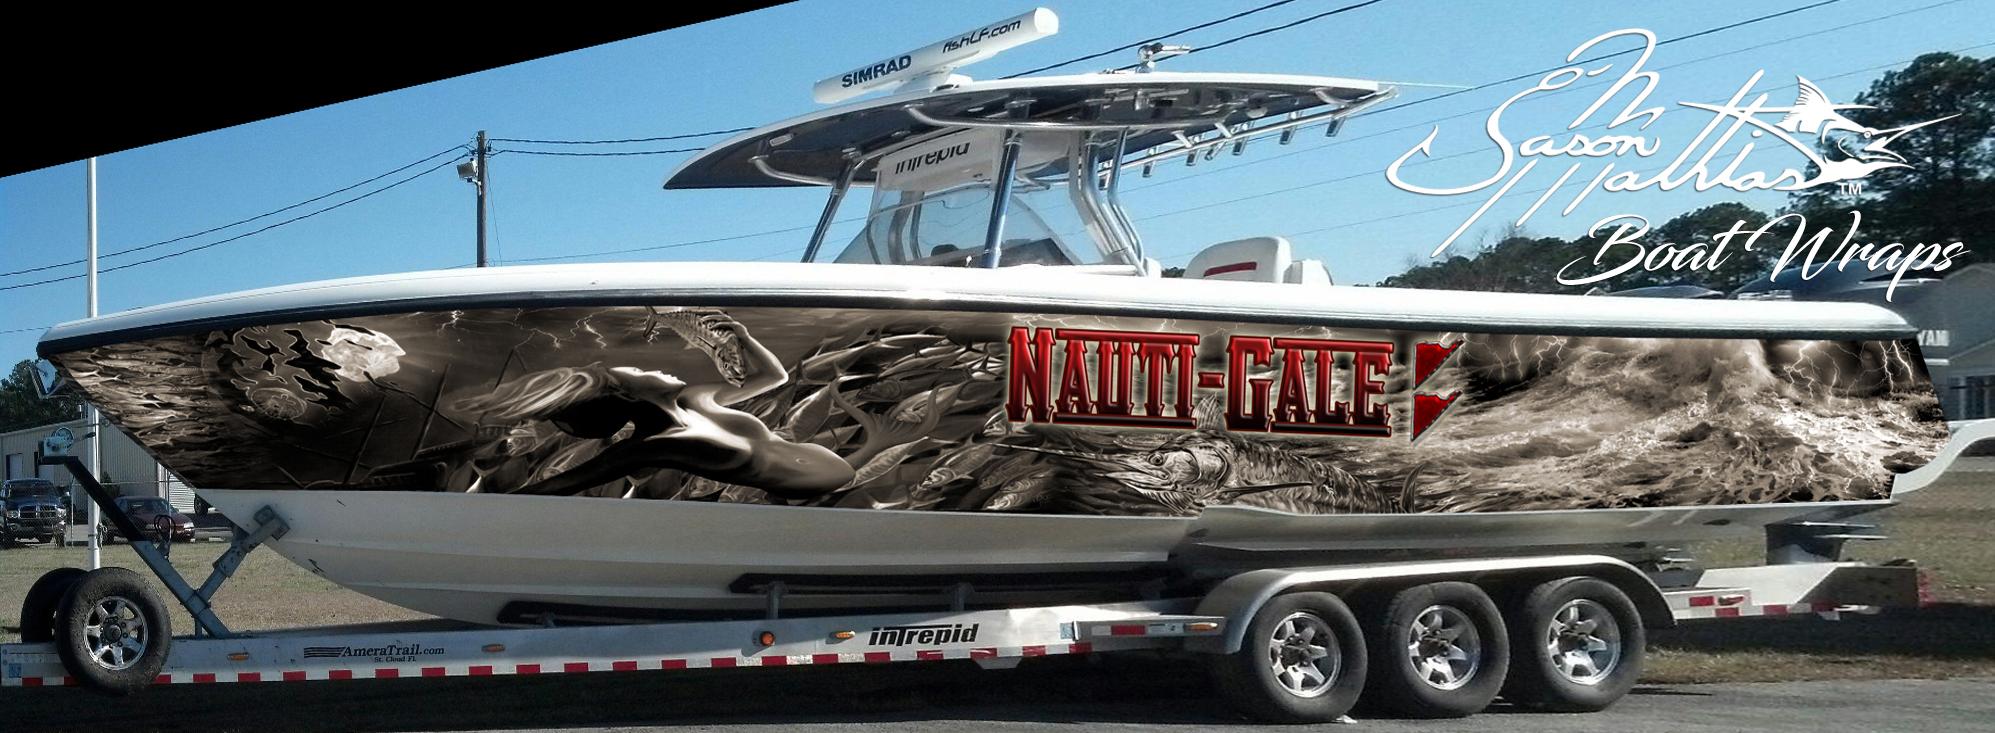 custom-boat-wraps-and-designs-by-jason-mathias-art.jpg